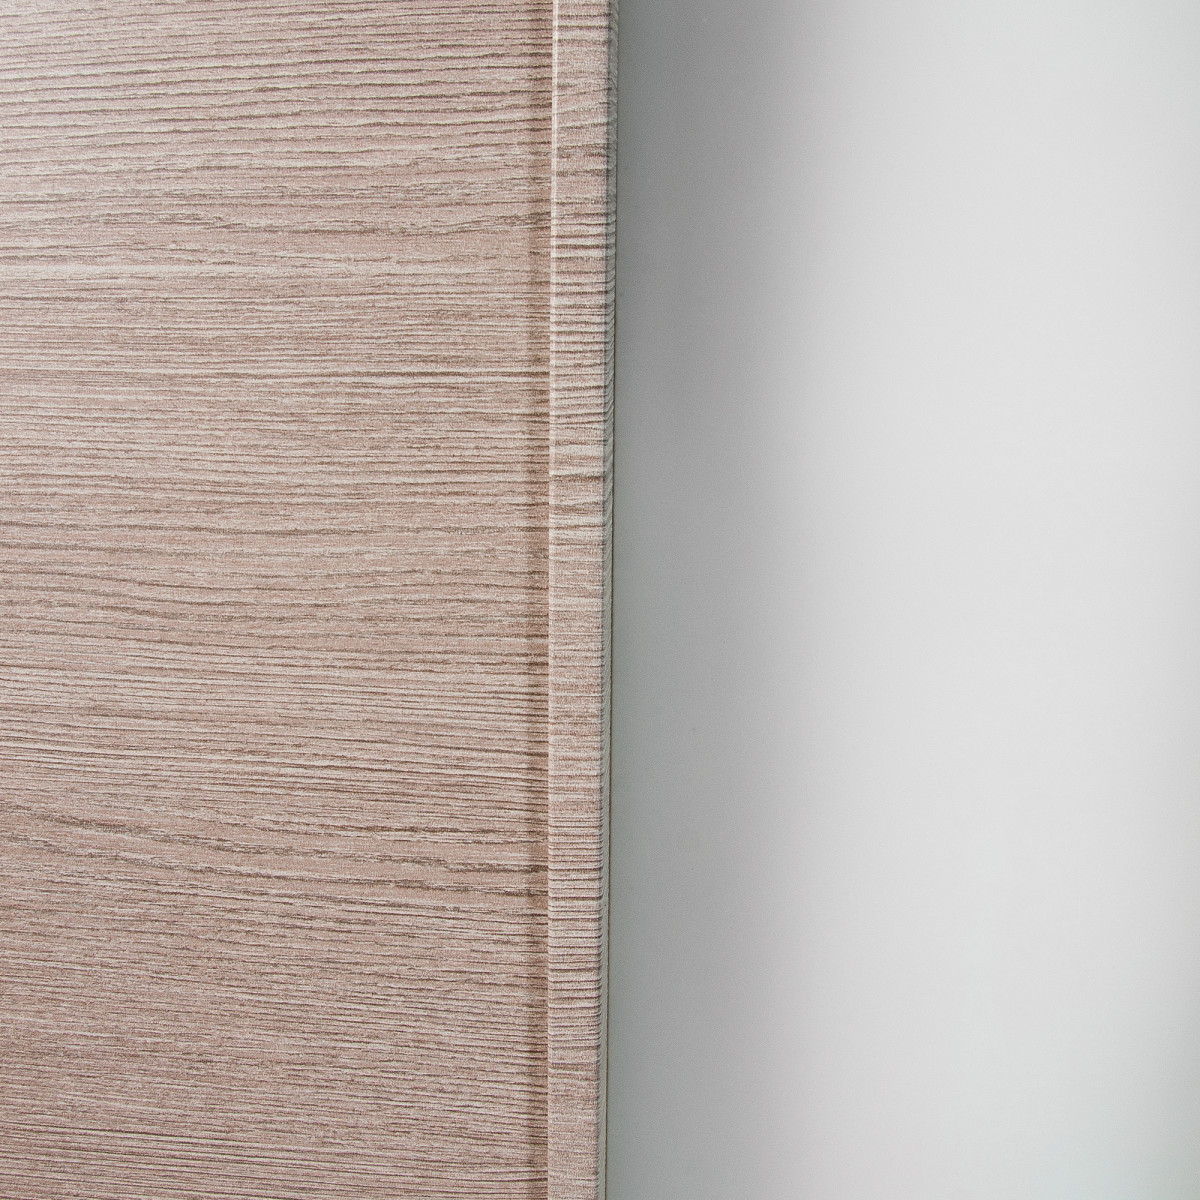 Дверь Межкомнатная Остеклённая 70x200 Ламинация Цвет Дуб Дымчатый